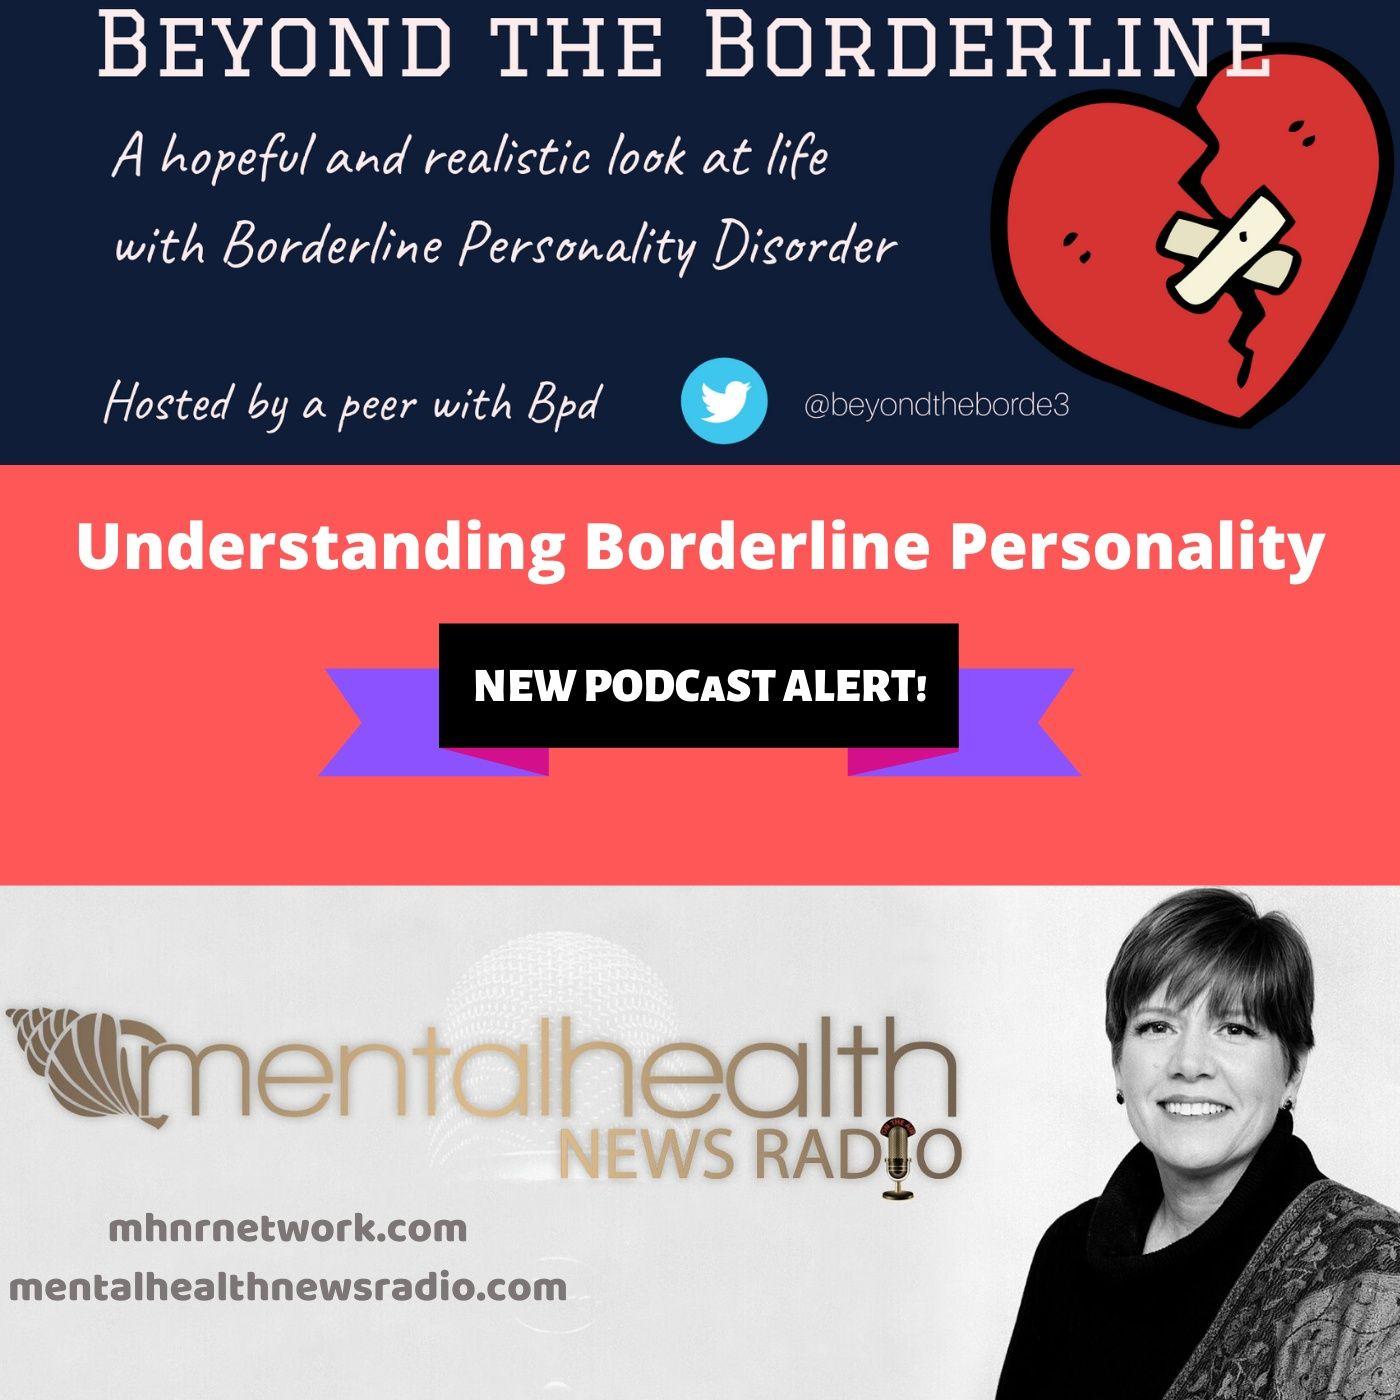 Mental Health News Radio - Beyond the Borderline: Understanding Borderline Personality